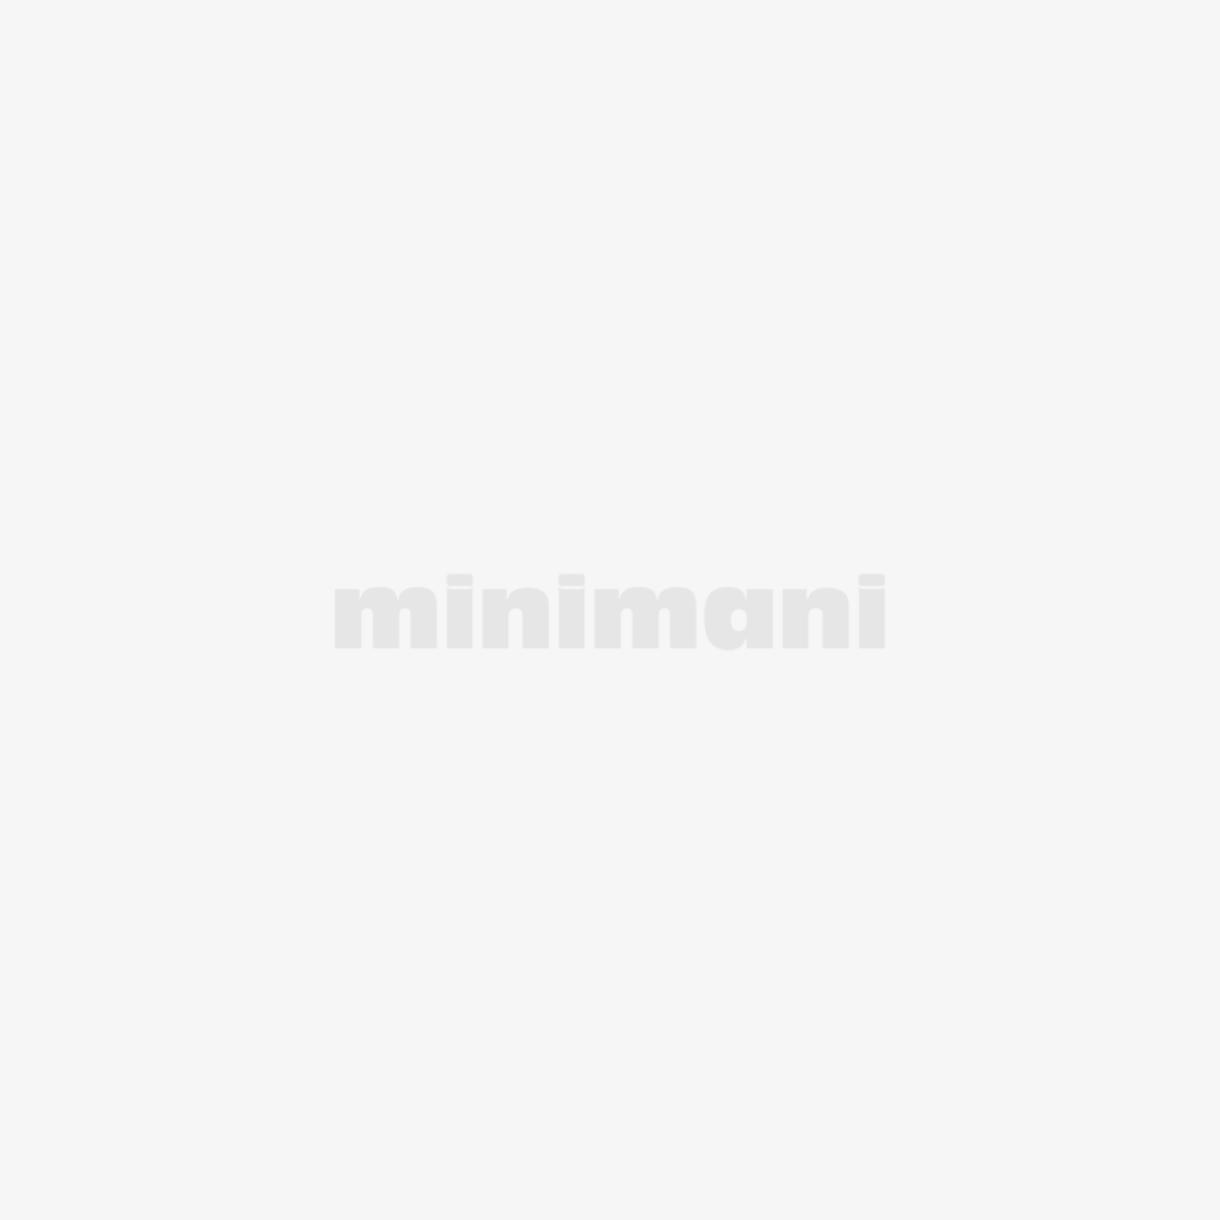 M-FILTER RAITISILMASUODATIN MAC 8012 FOCUS II,C30,S40,V50